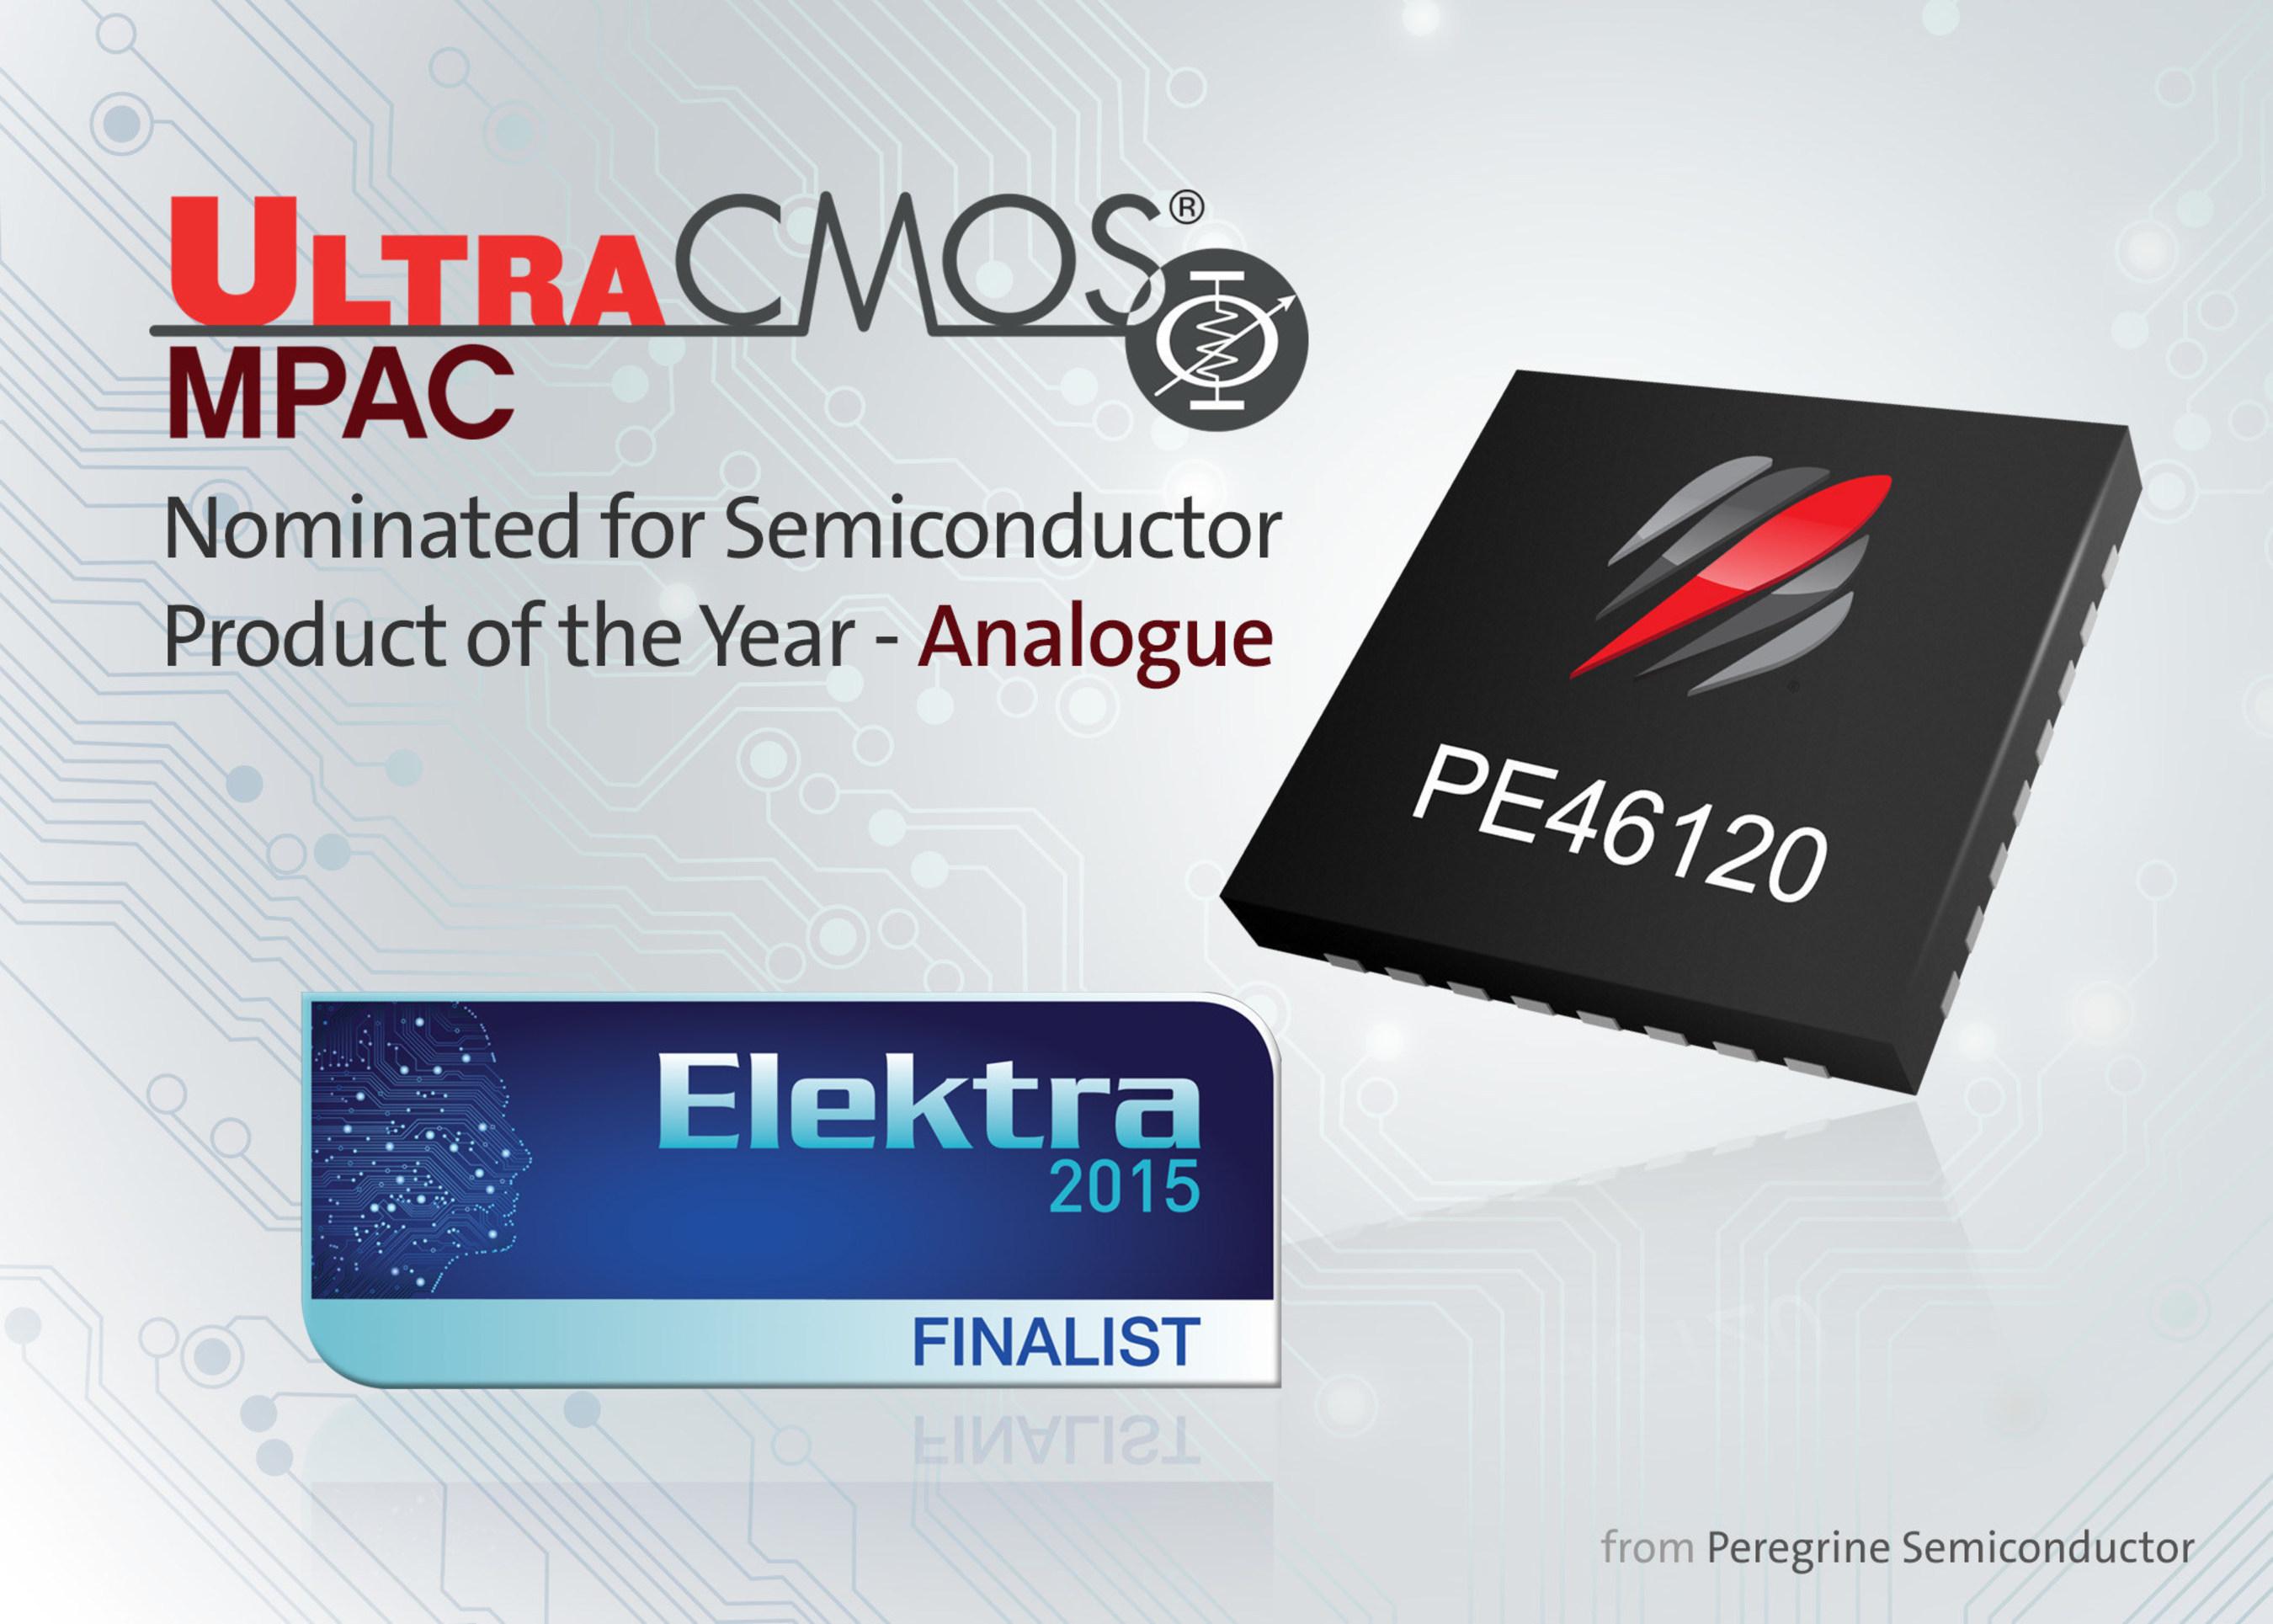 Peregrine Semiconductor Named Finalist in Elektra Awards